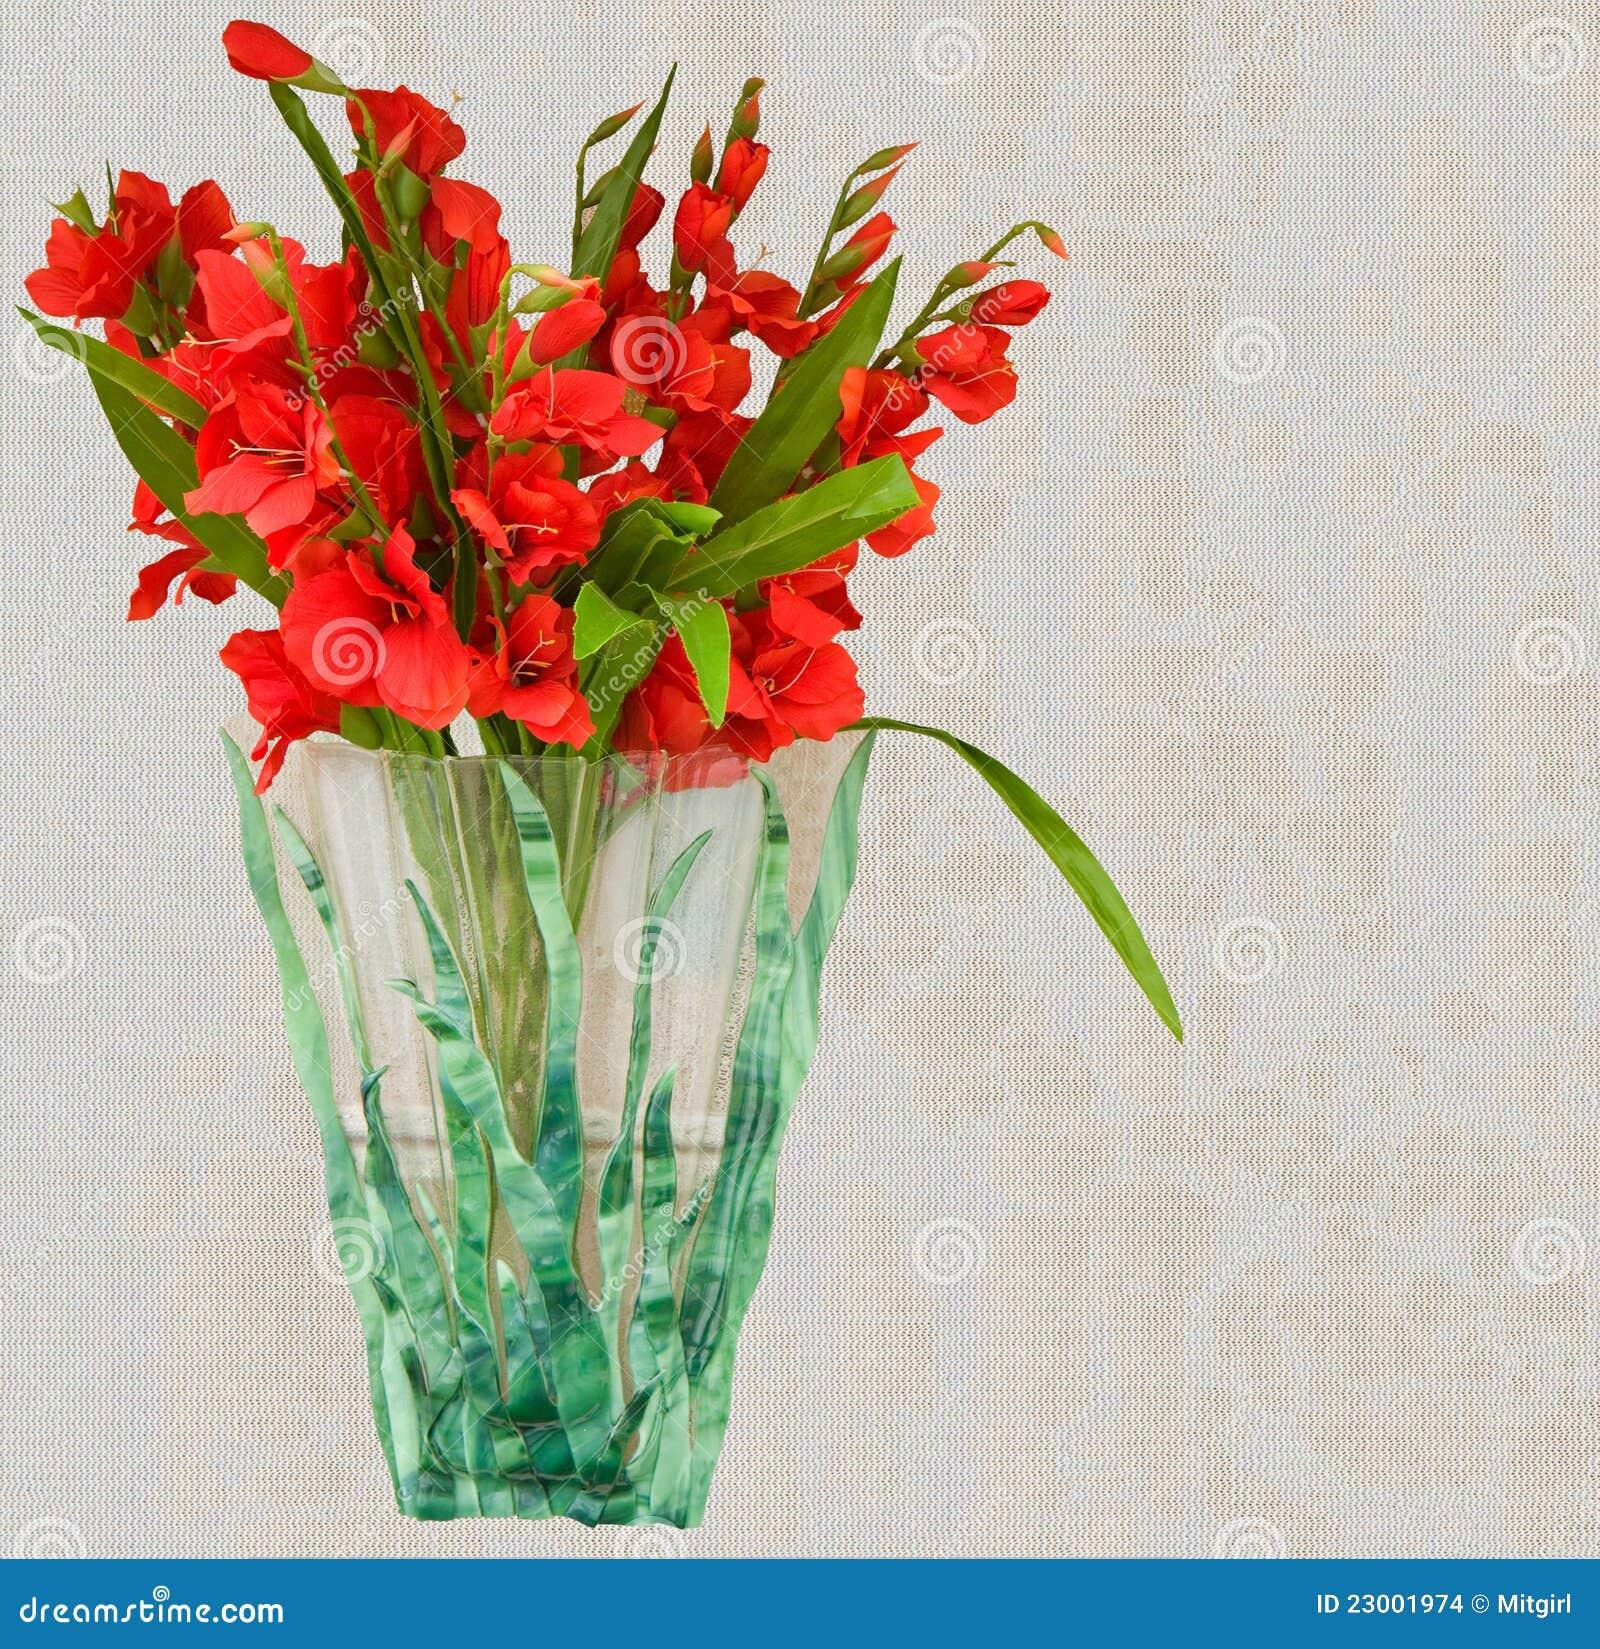 Beautiful Red Gladiolus Flower Vase Stock Images - Image ...